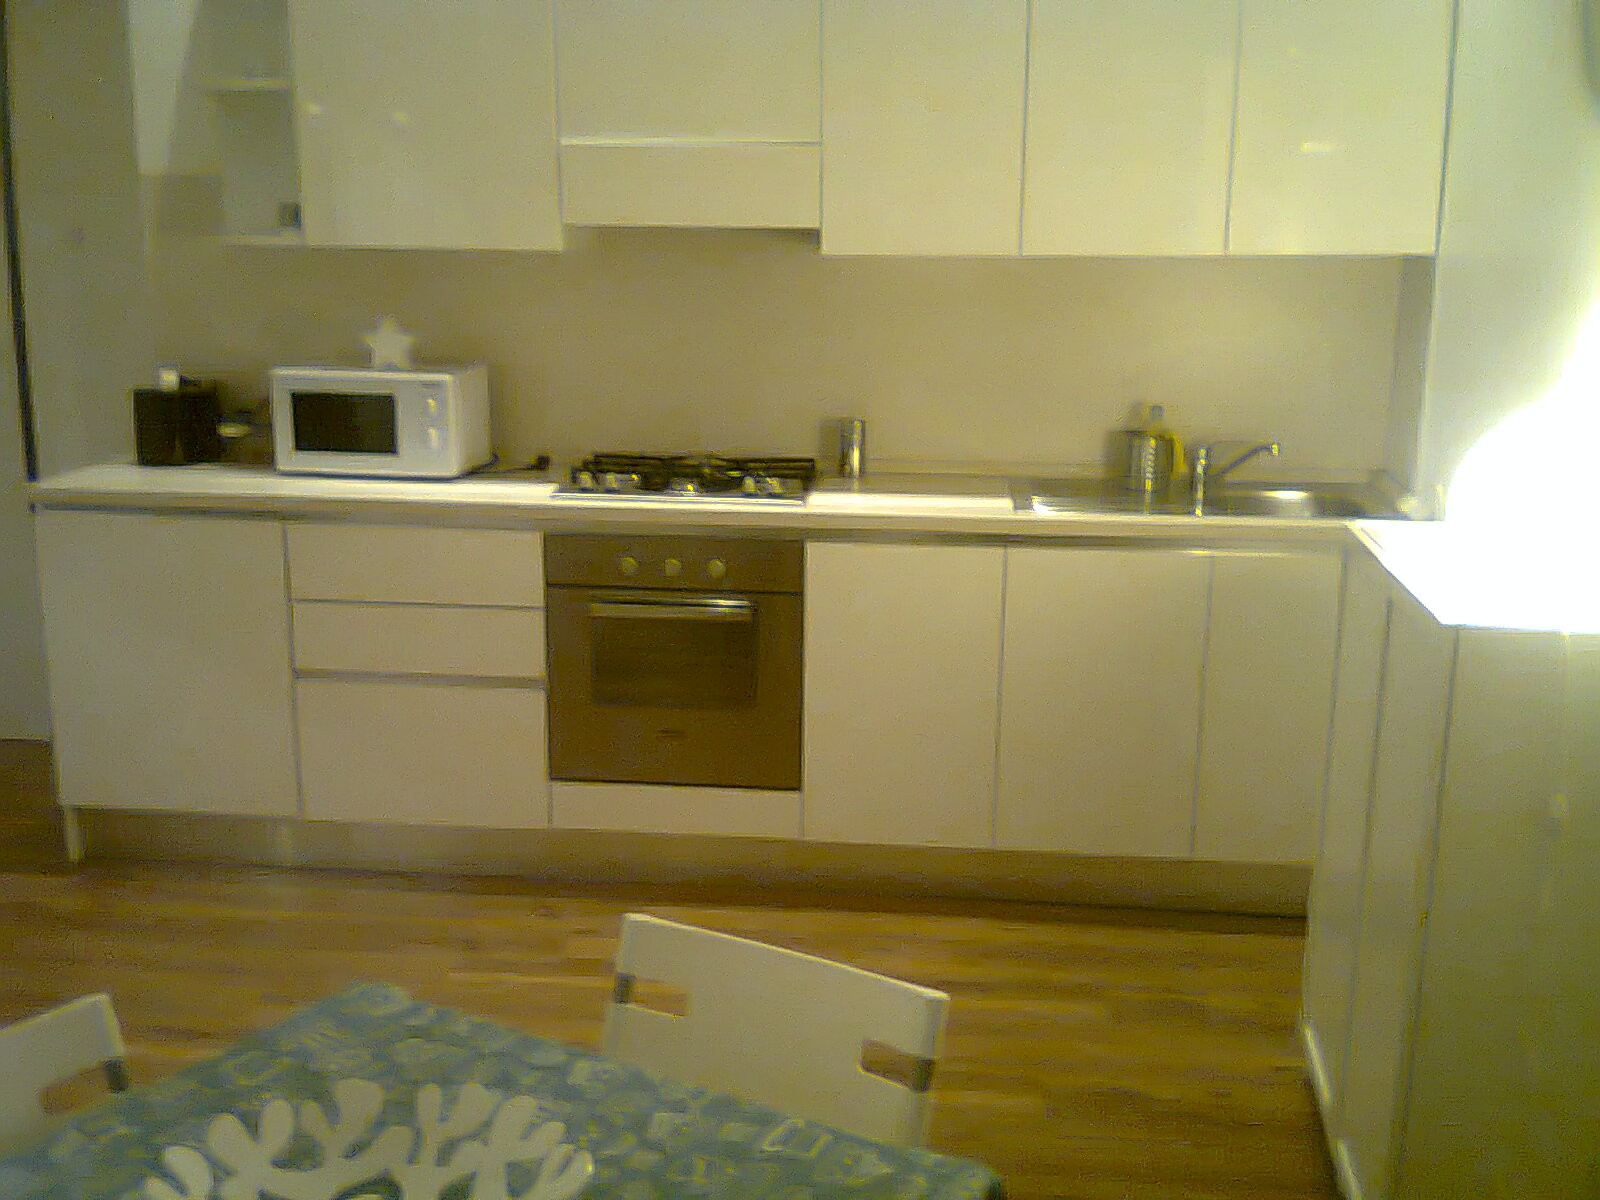 affitto casa vacanze citta roma 8086 (20130307110314-2013-67636-NDP.jpg)